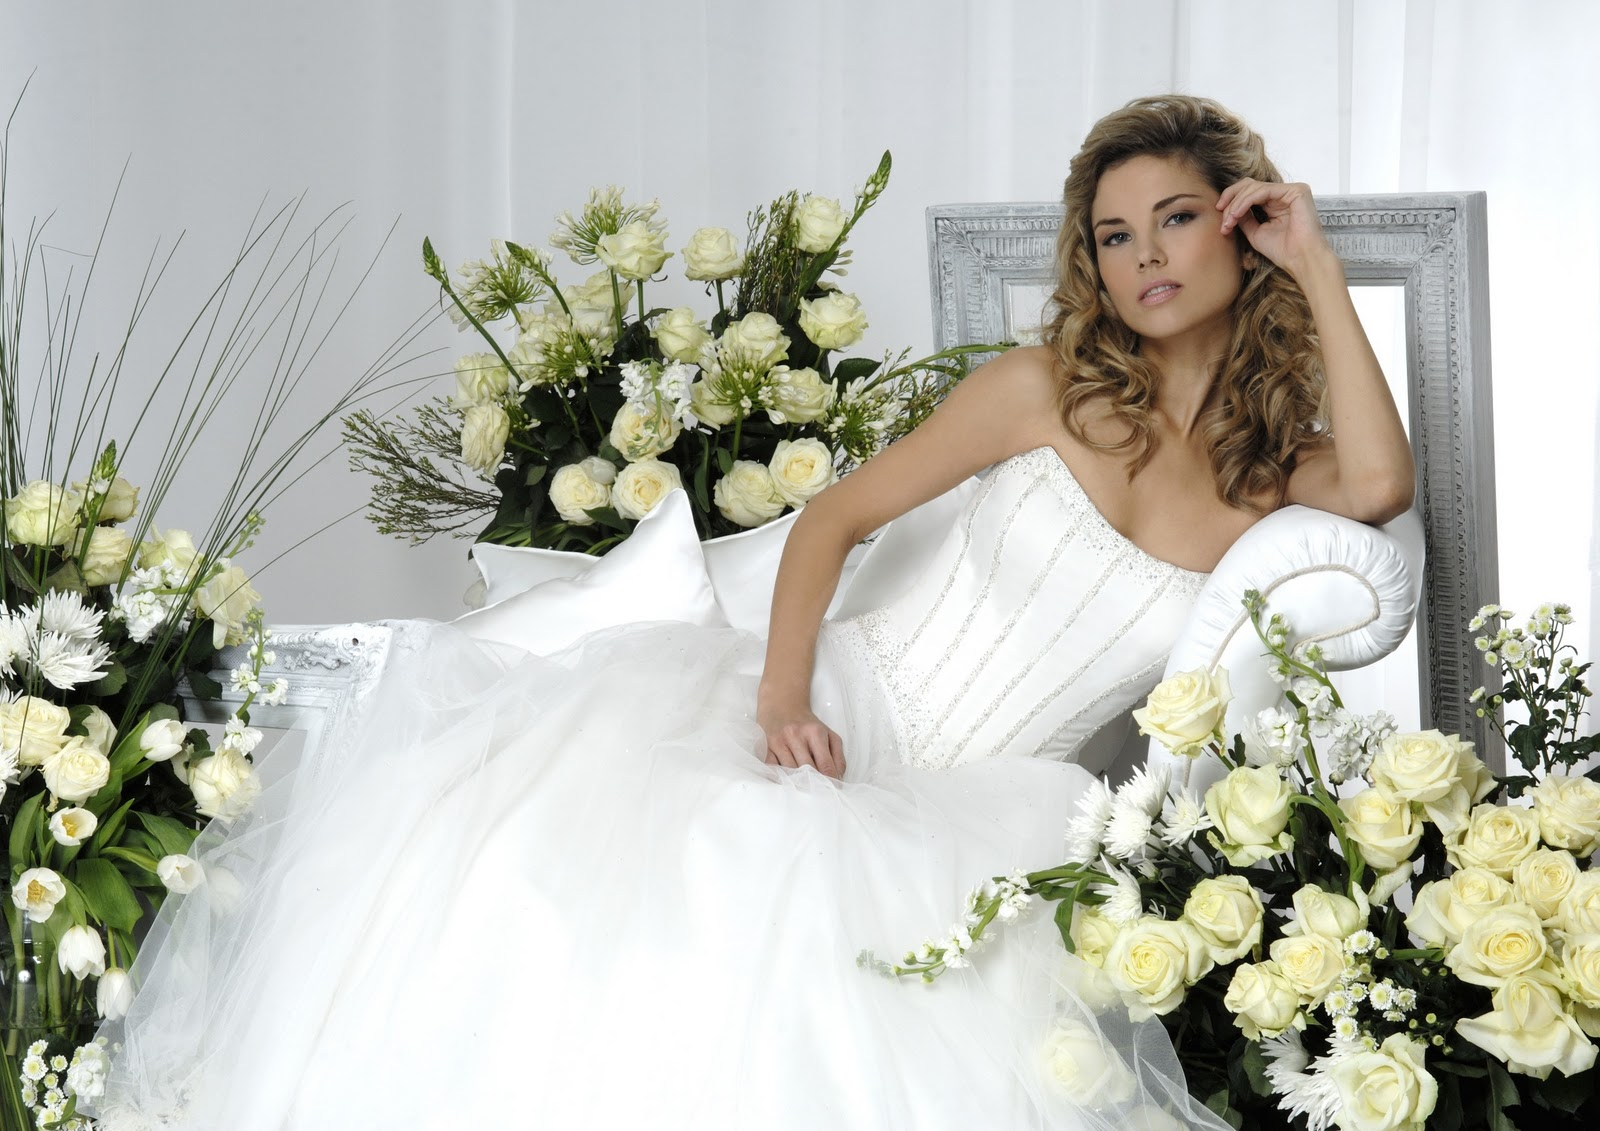 Jewelry Designs: Hot Brides